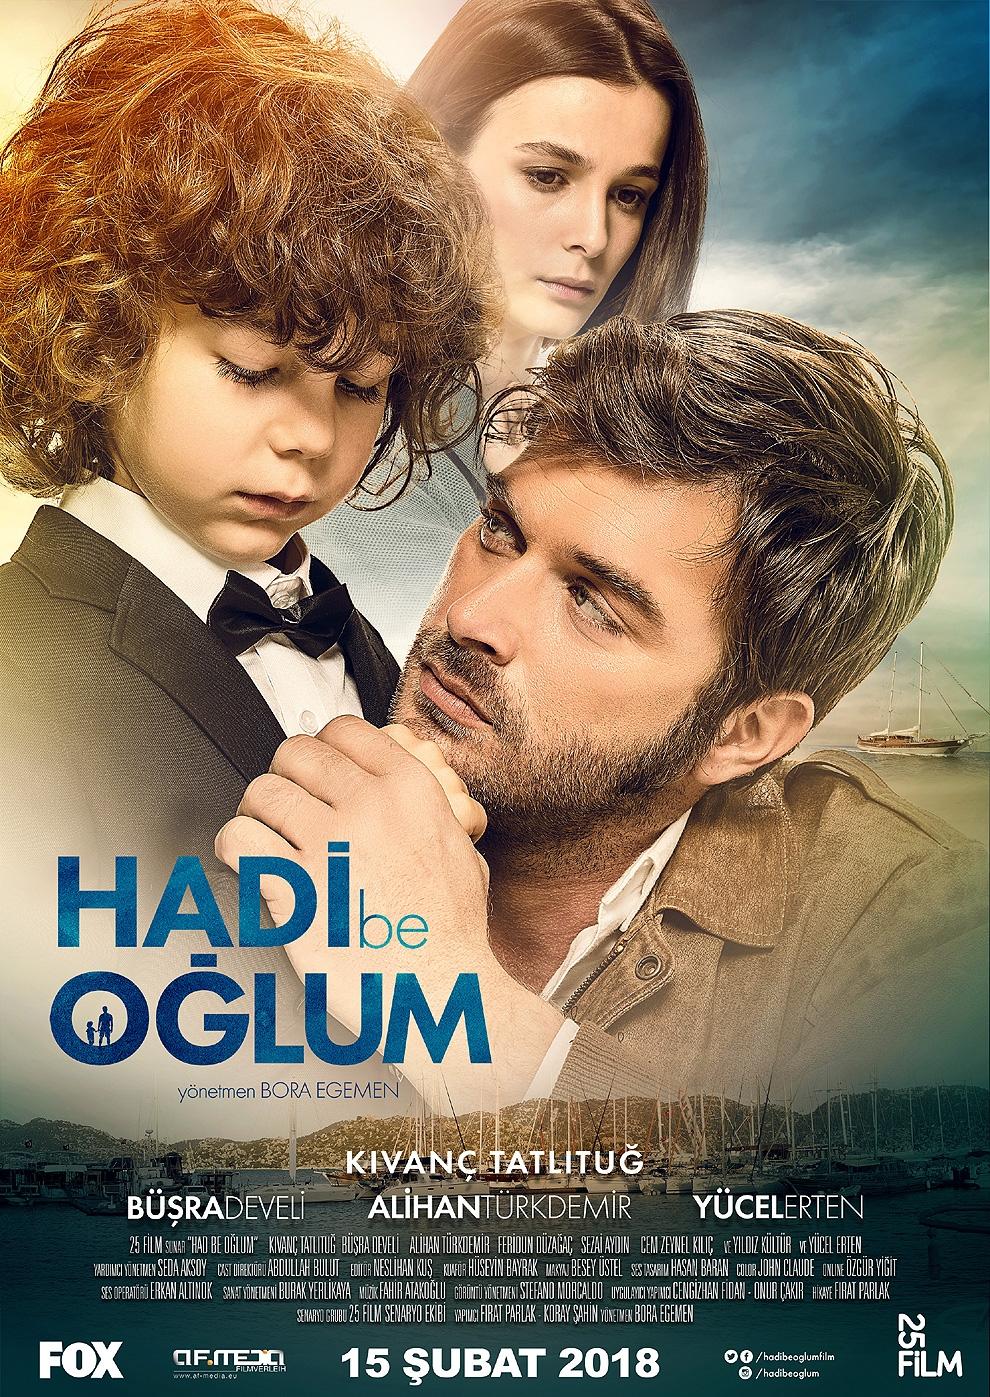 Hadi Be Oglum (Poster)